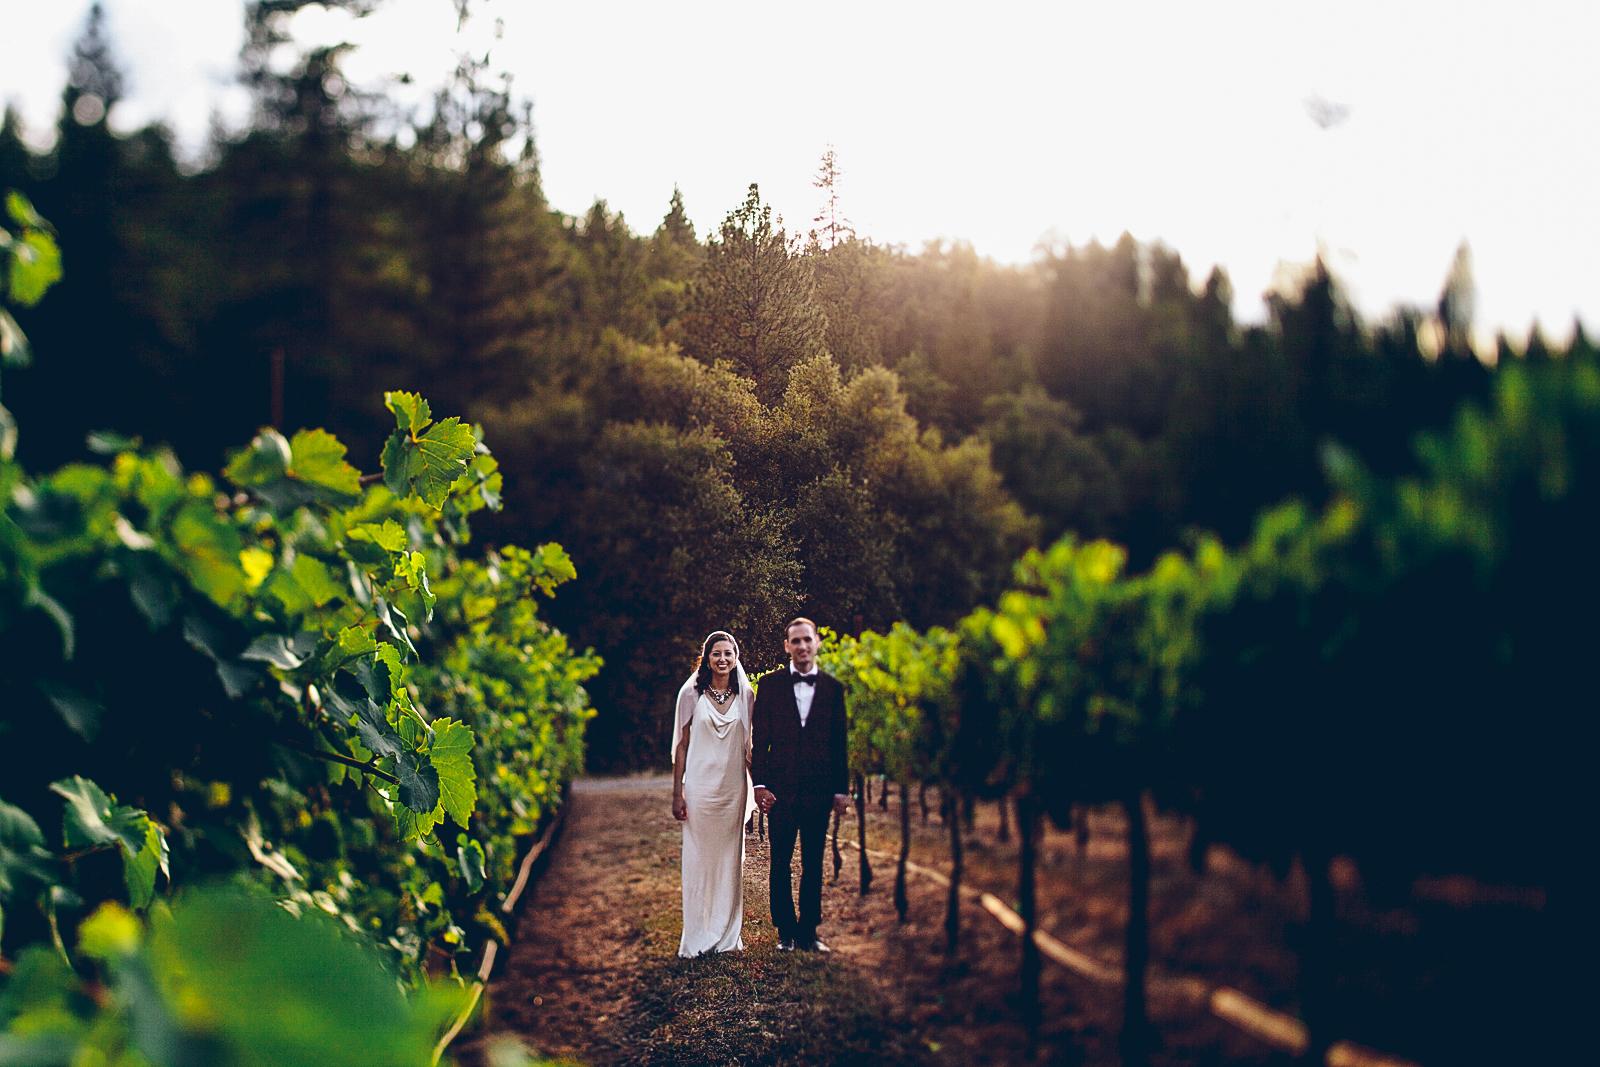 miraflores_winery_wedding_photography_ian_melissa_ebony_siovhan_bokeh_photography_51.jpg